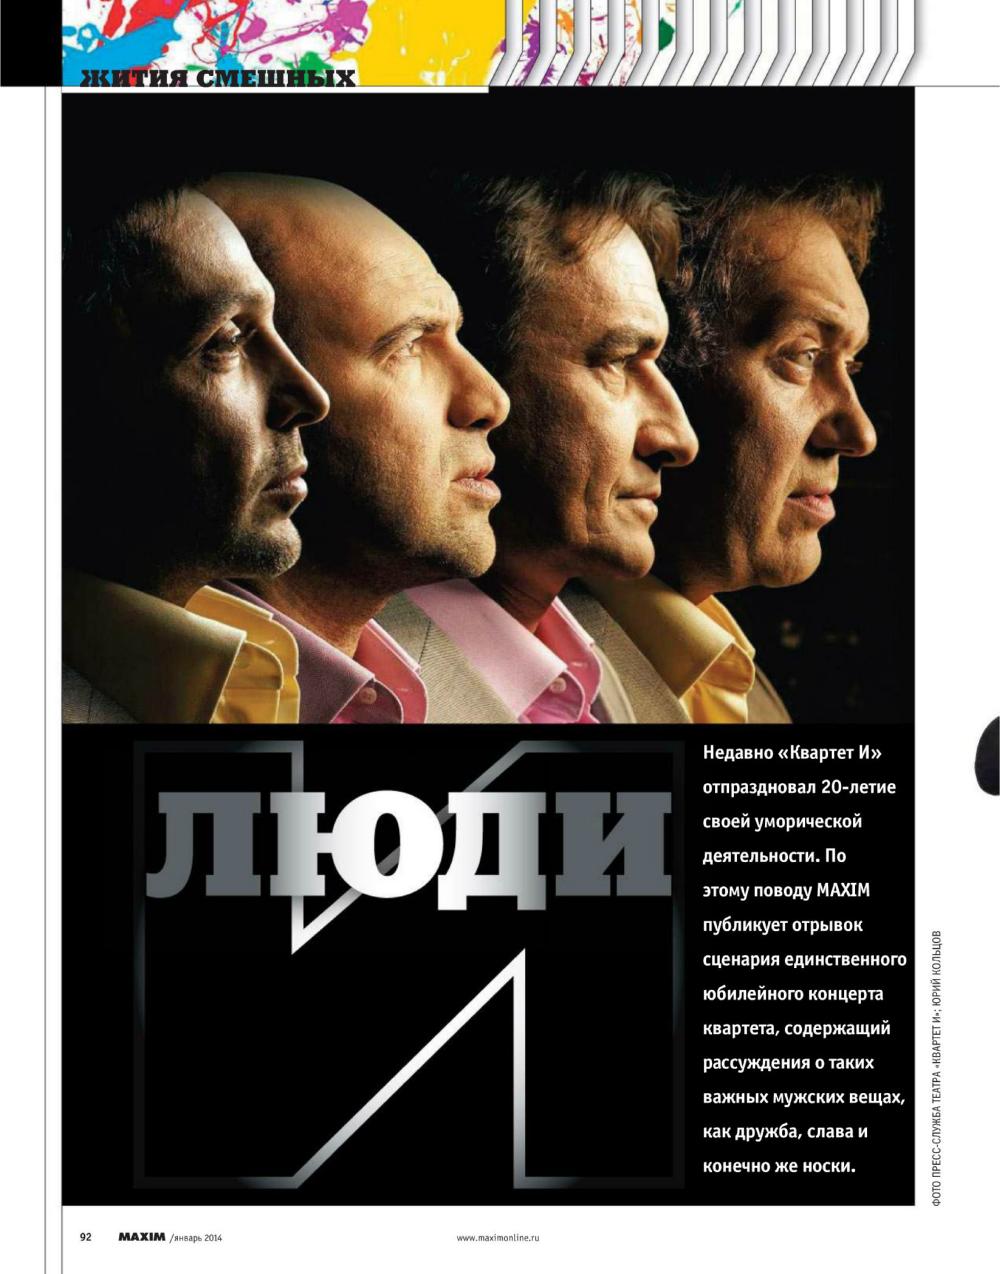 http://i1.imageban.ru/out/2013/12/17/0cf04b08806e5949c7768ce41d2bf2c3.jpg